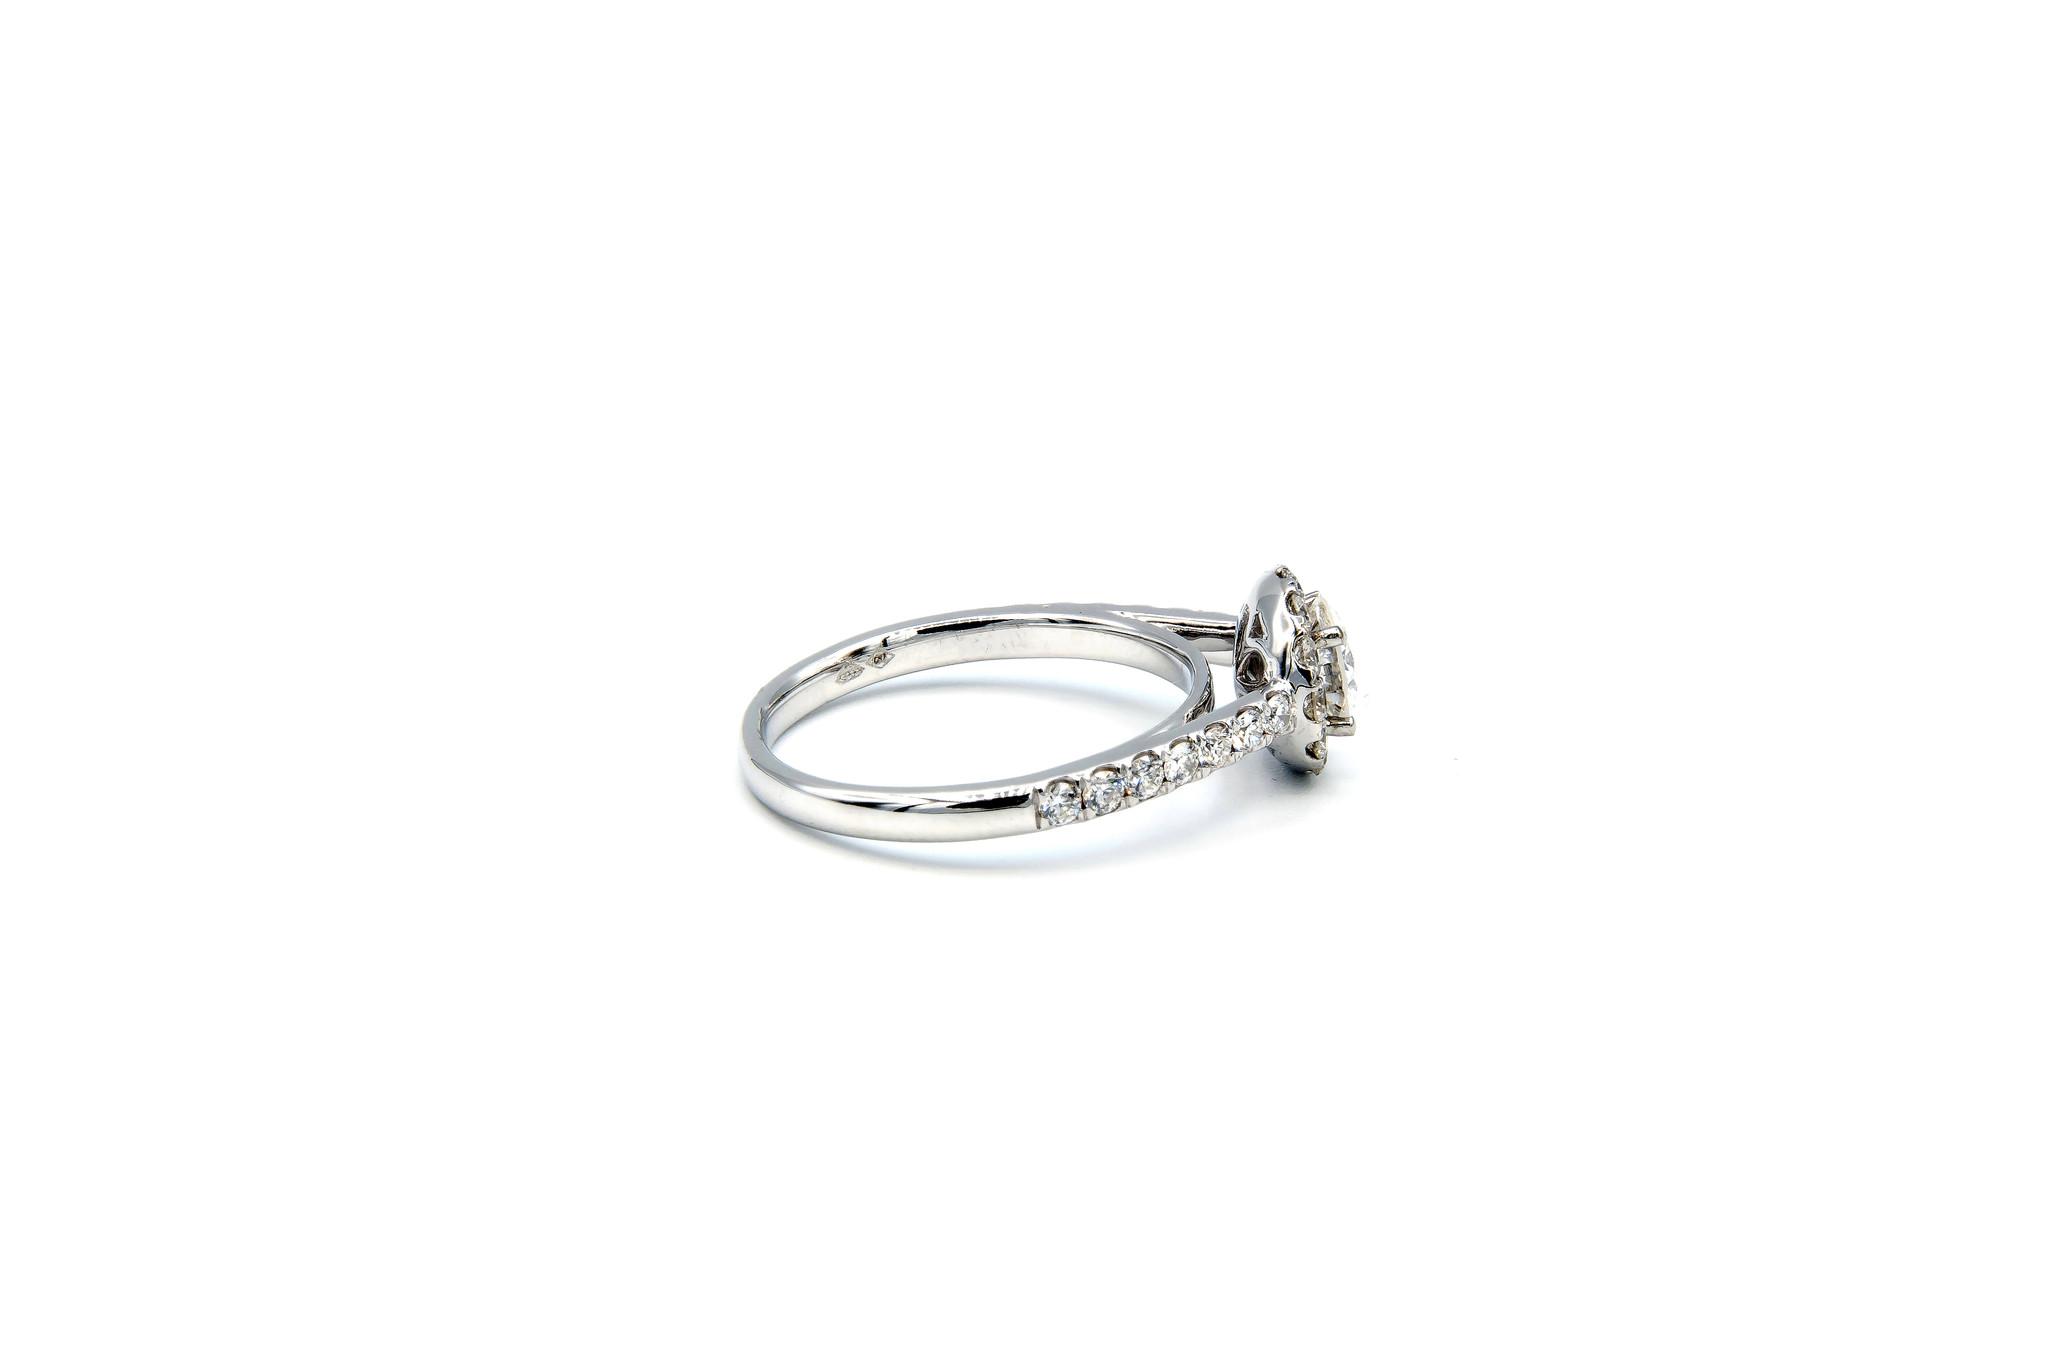 Ring verlovingsring witgoud met 0,5 ct SI en 0,59 ct VS diamant-3